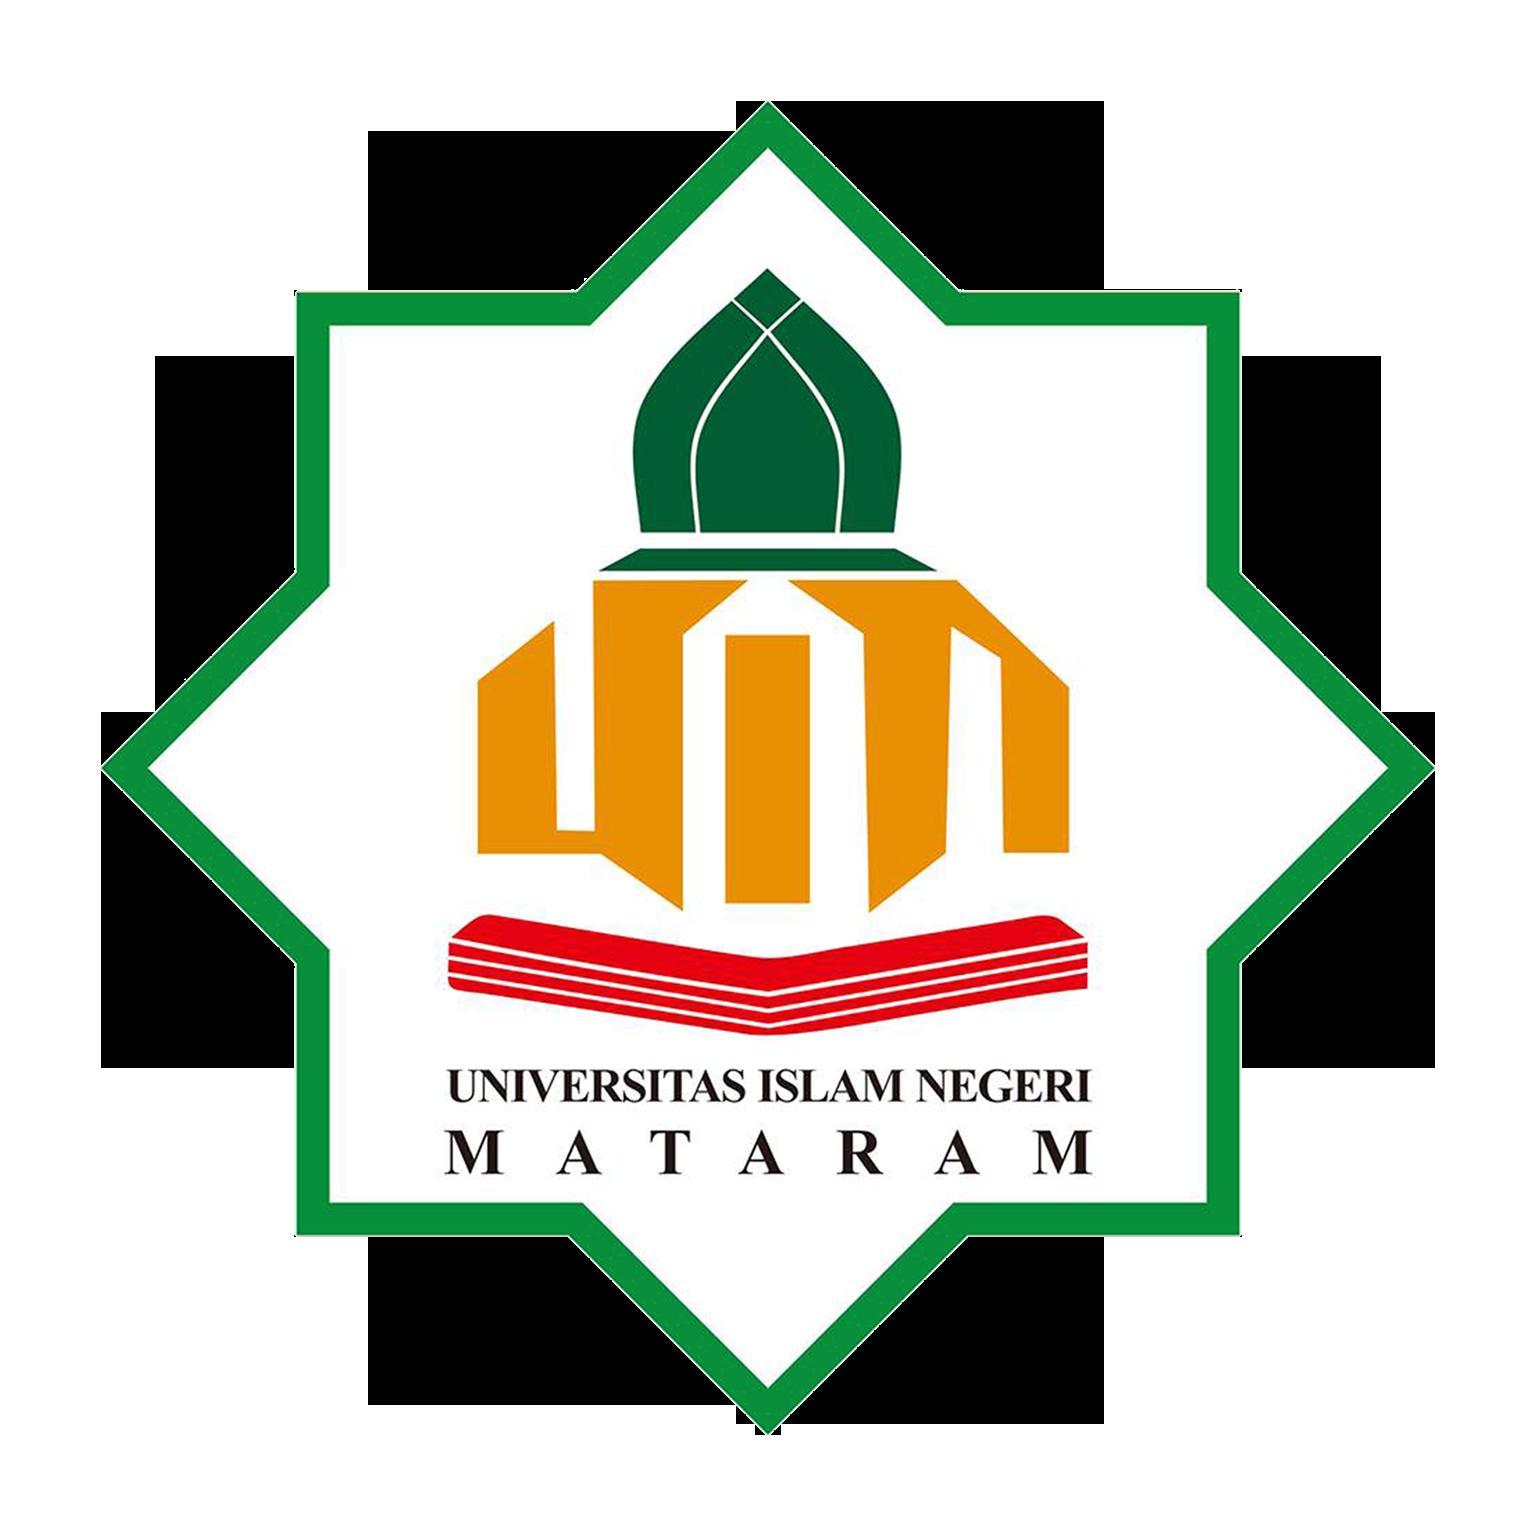 Logo UIN Mataram (Universitas Islam Negeri Mataram)